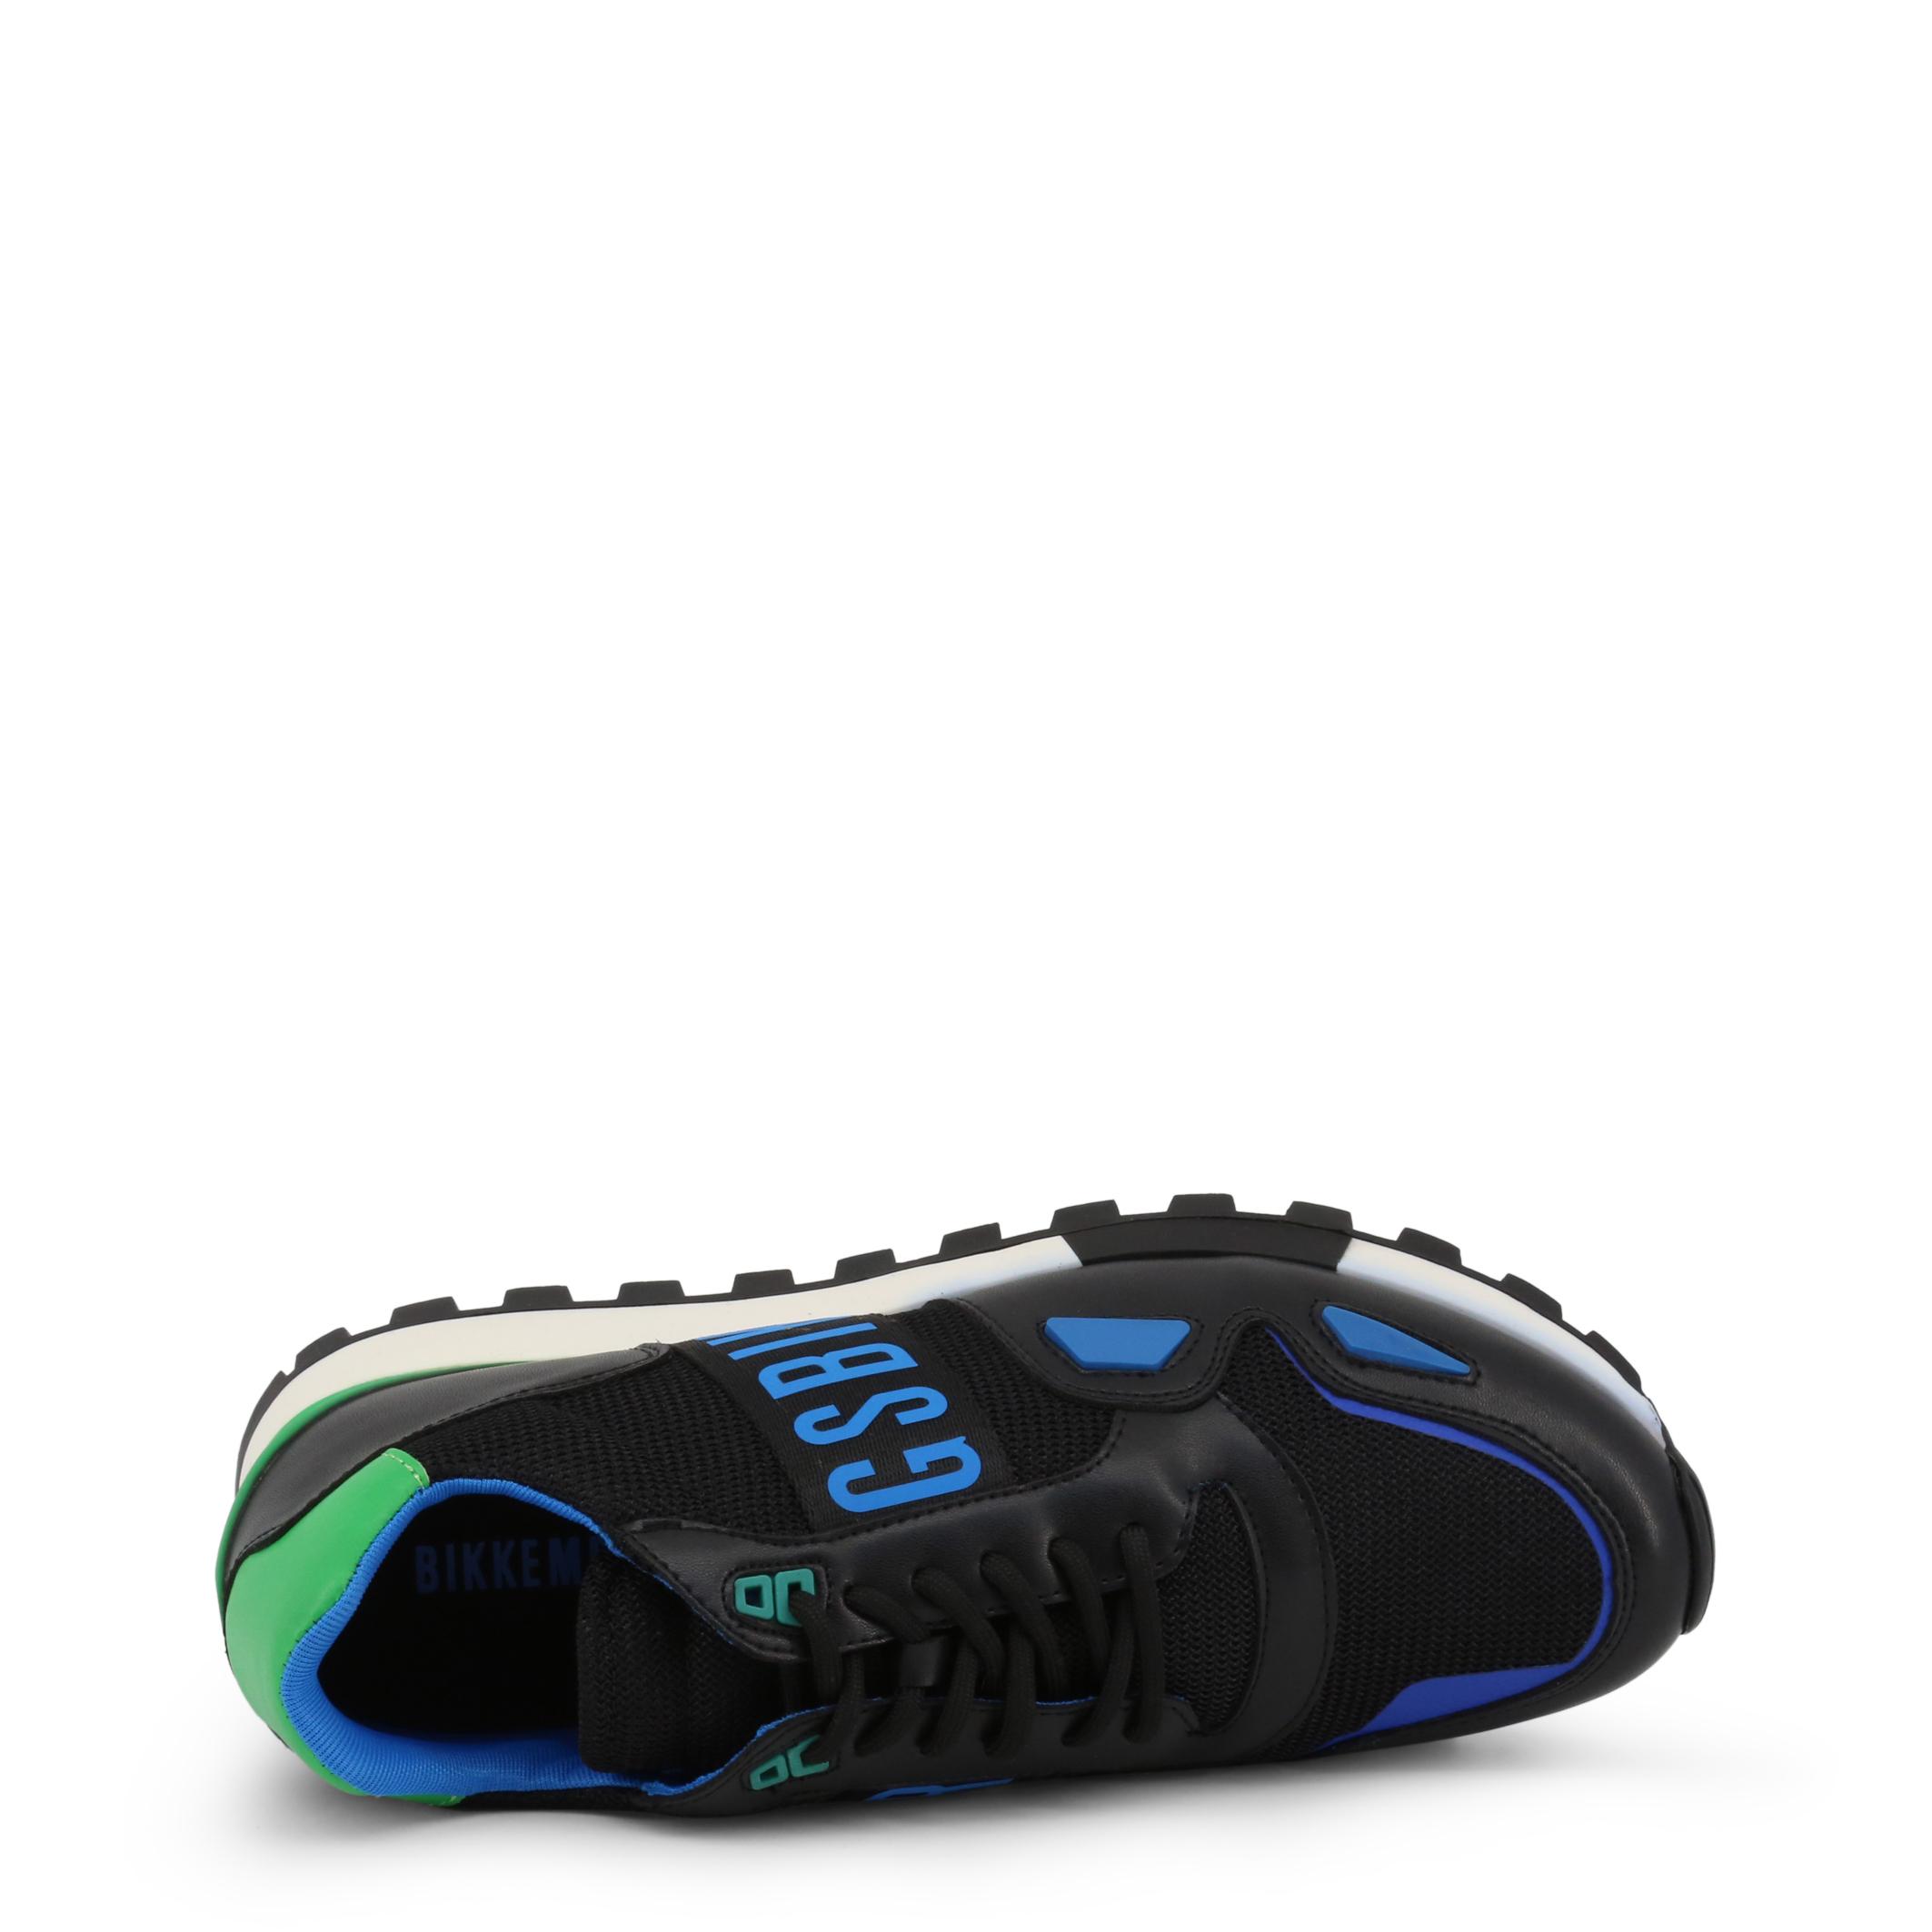 Sneakers-Bikkembergs-FEND-ER-2232-Uomo-Nero-101346 miniatura 3